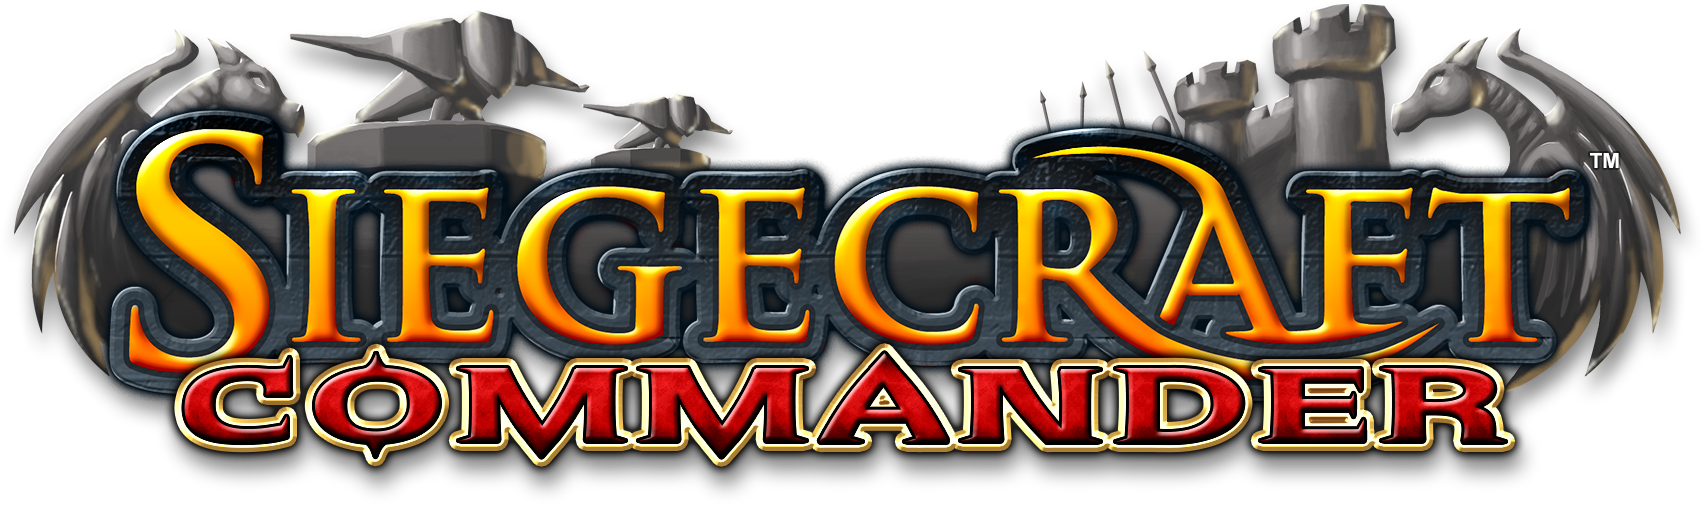 Siegecraft Commander logo